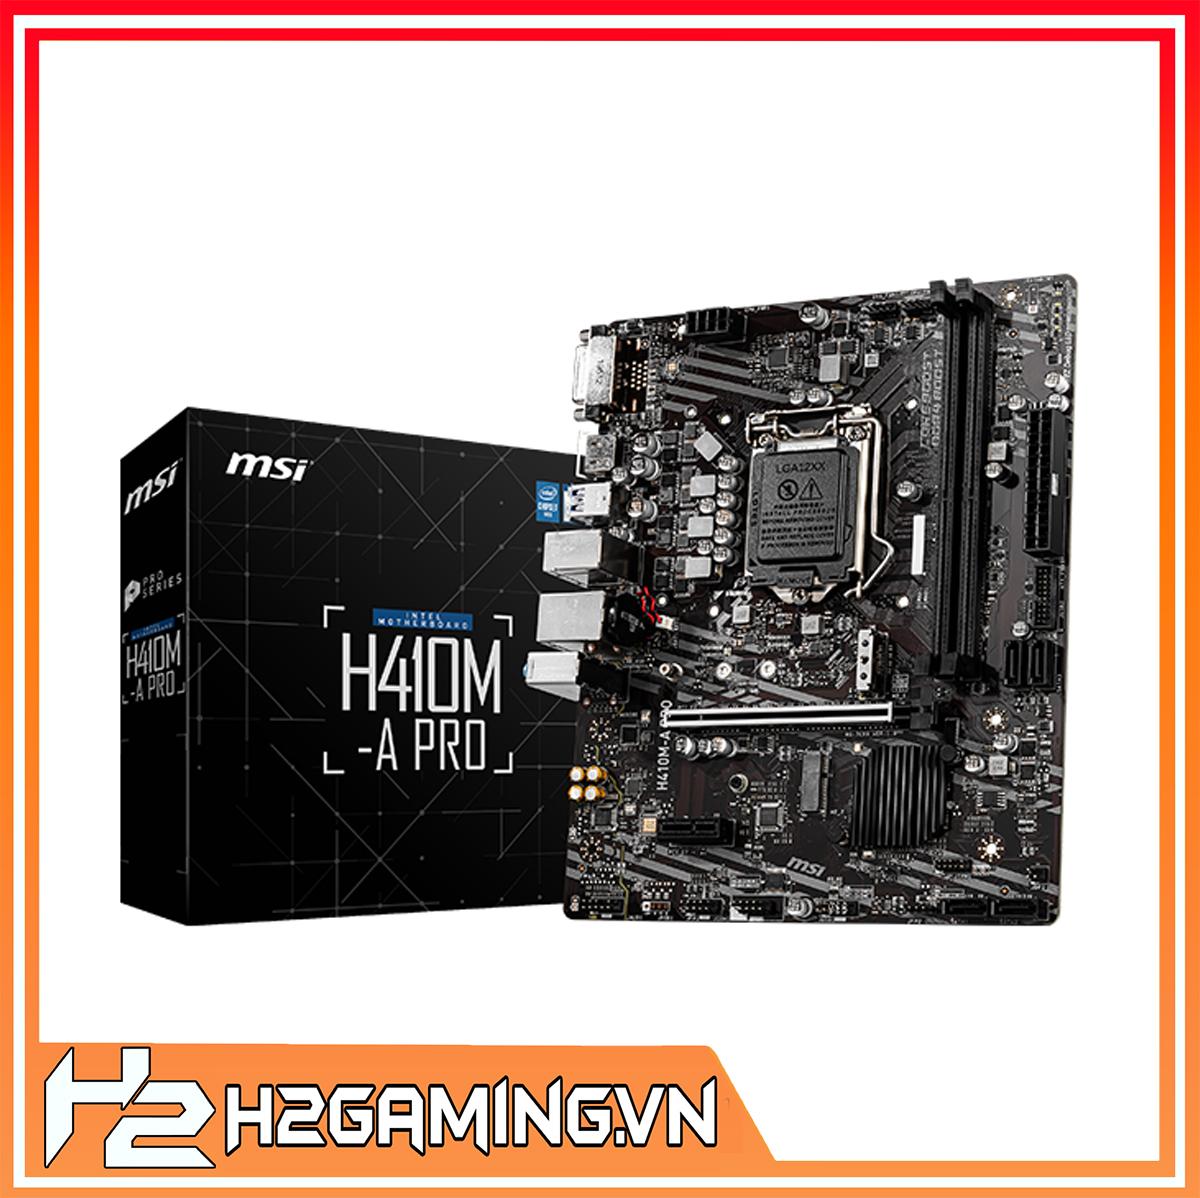 Mainboard_MSI_H410M-A_PRO